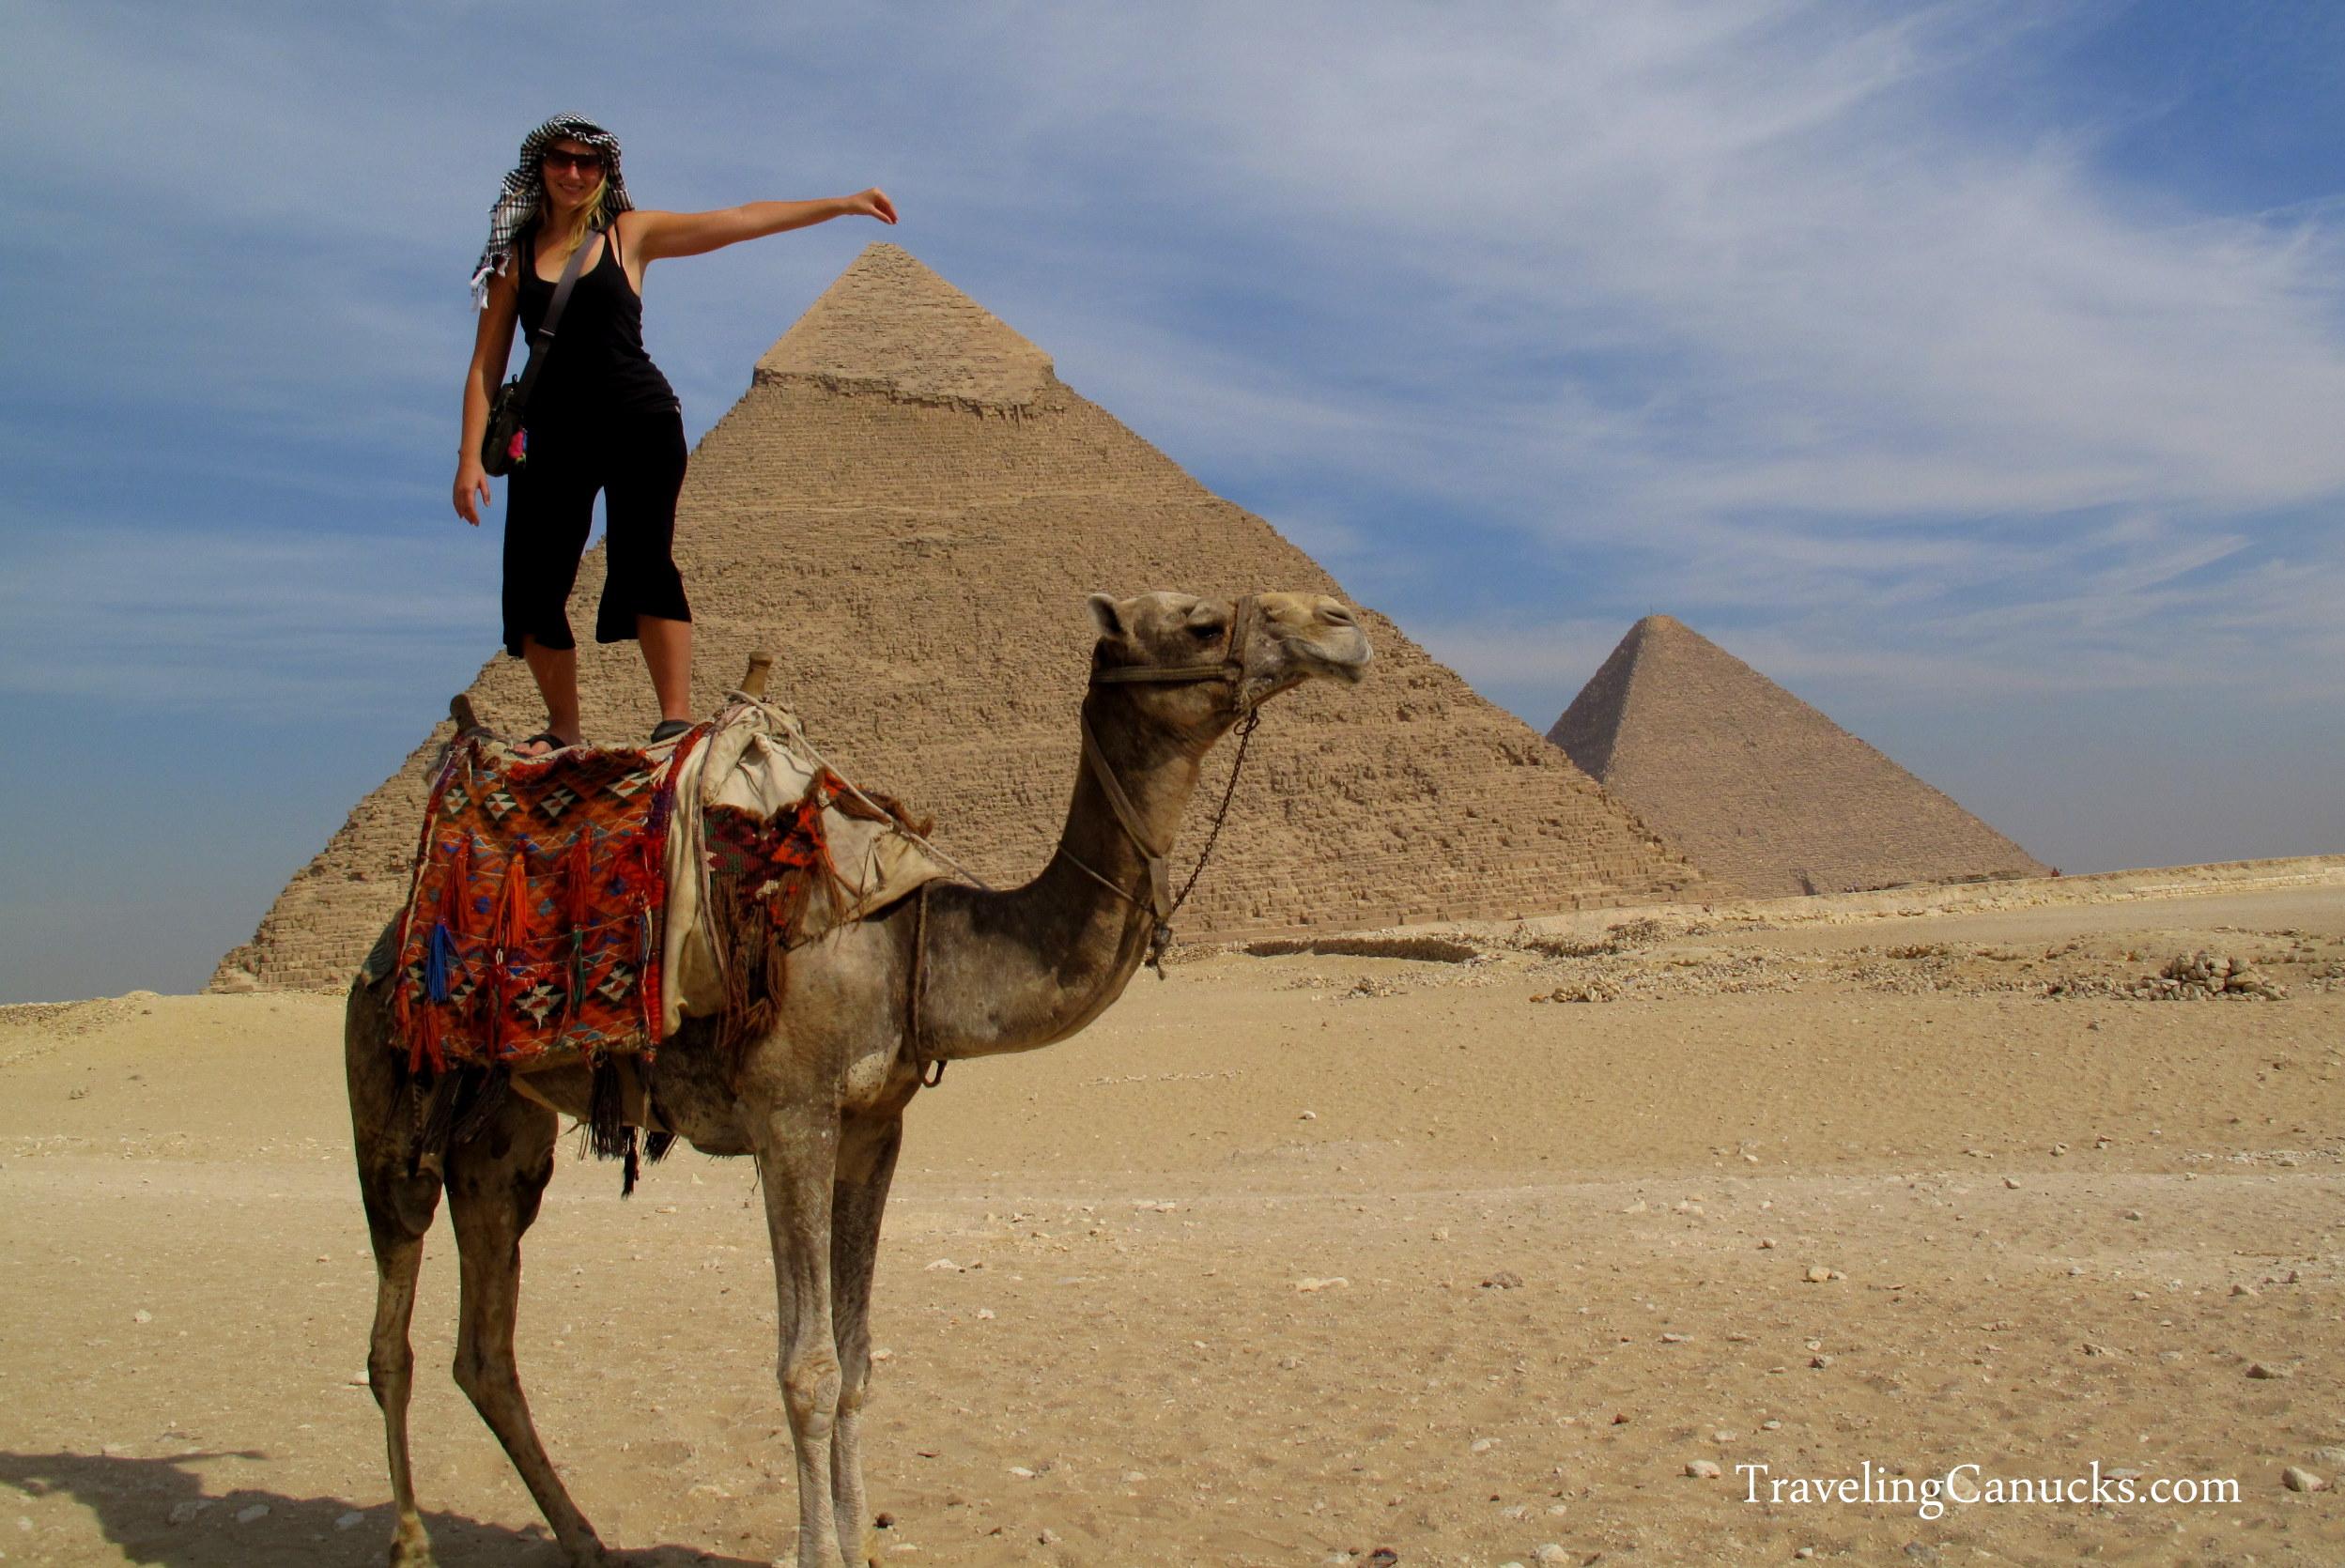 12102018 Egypt investigates pyramid nude photo shoot